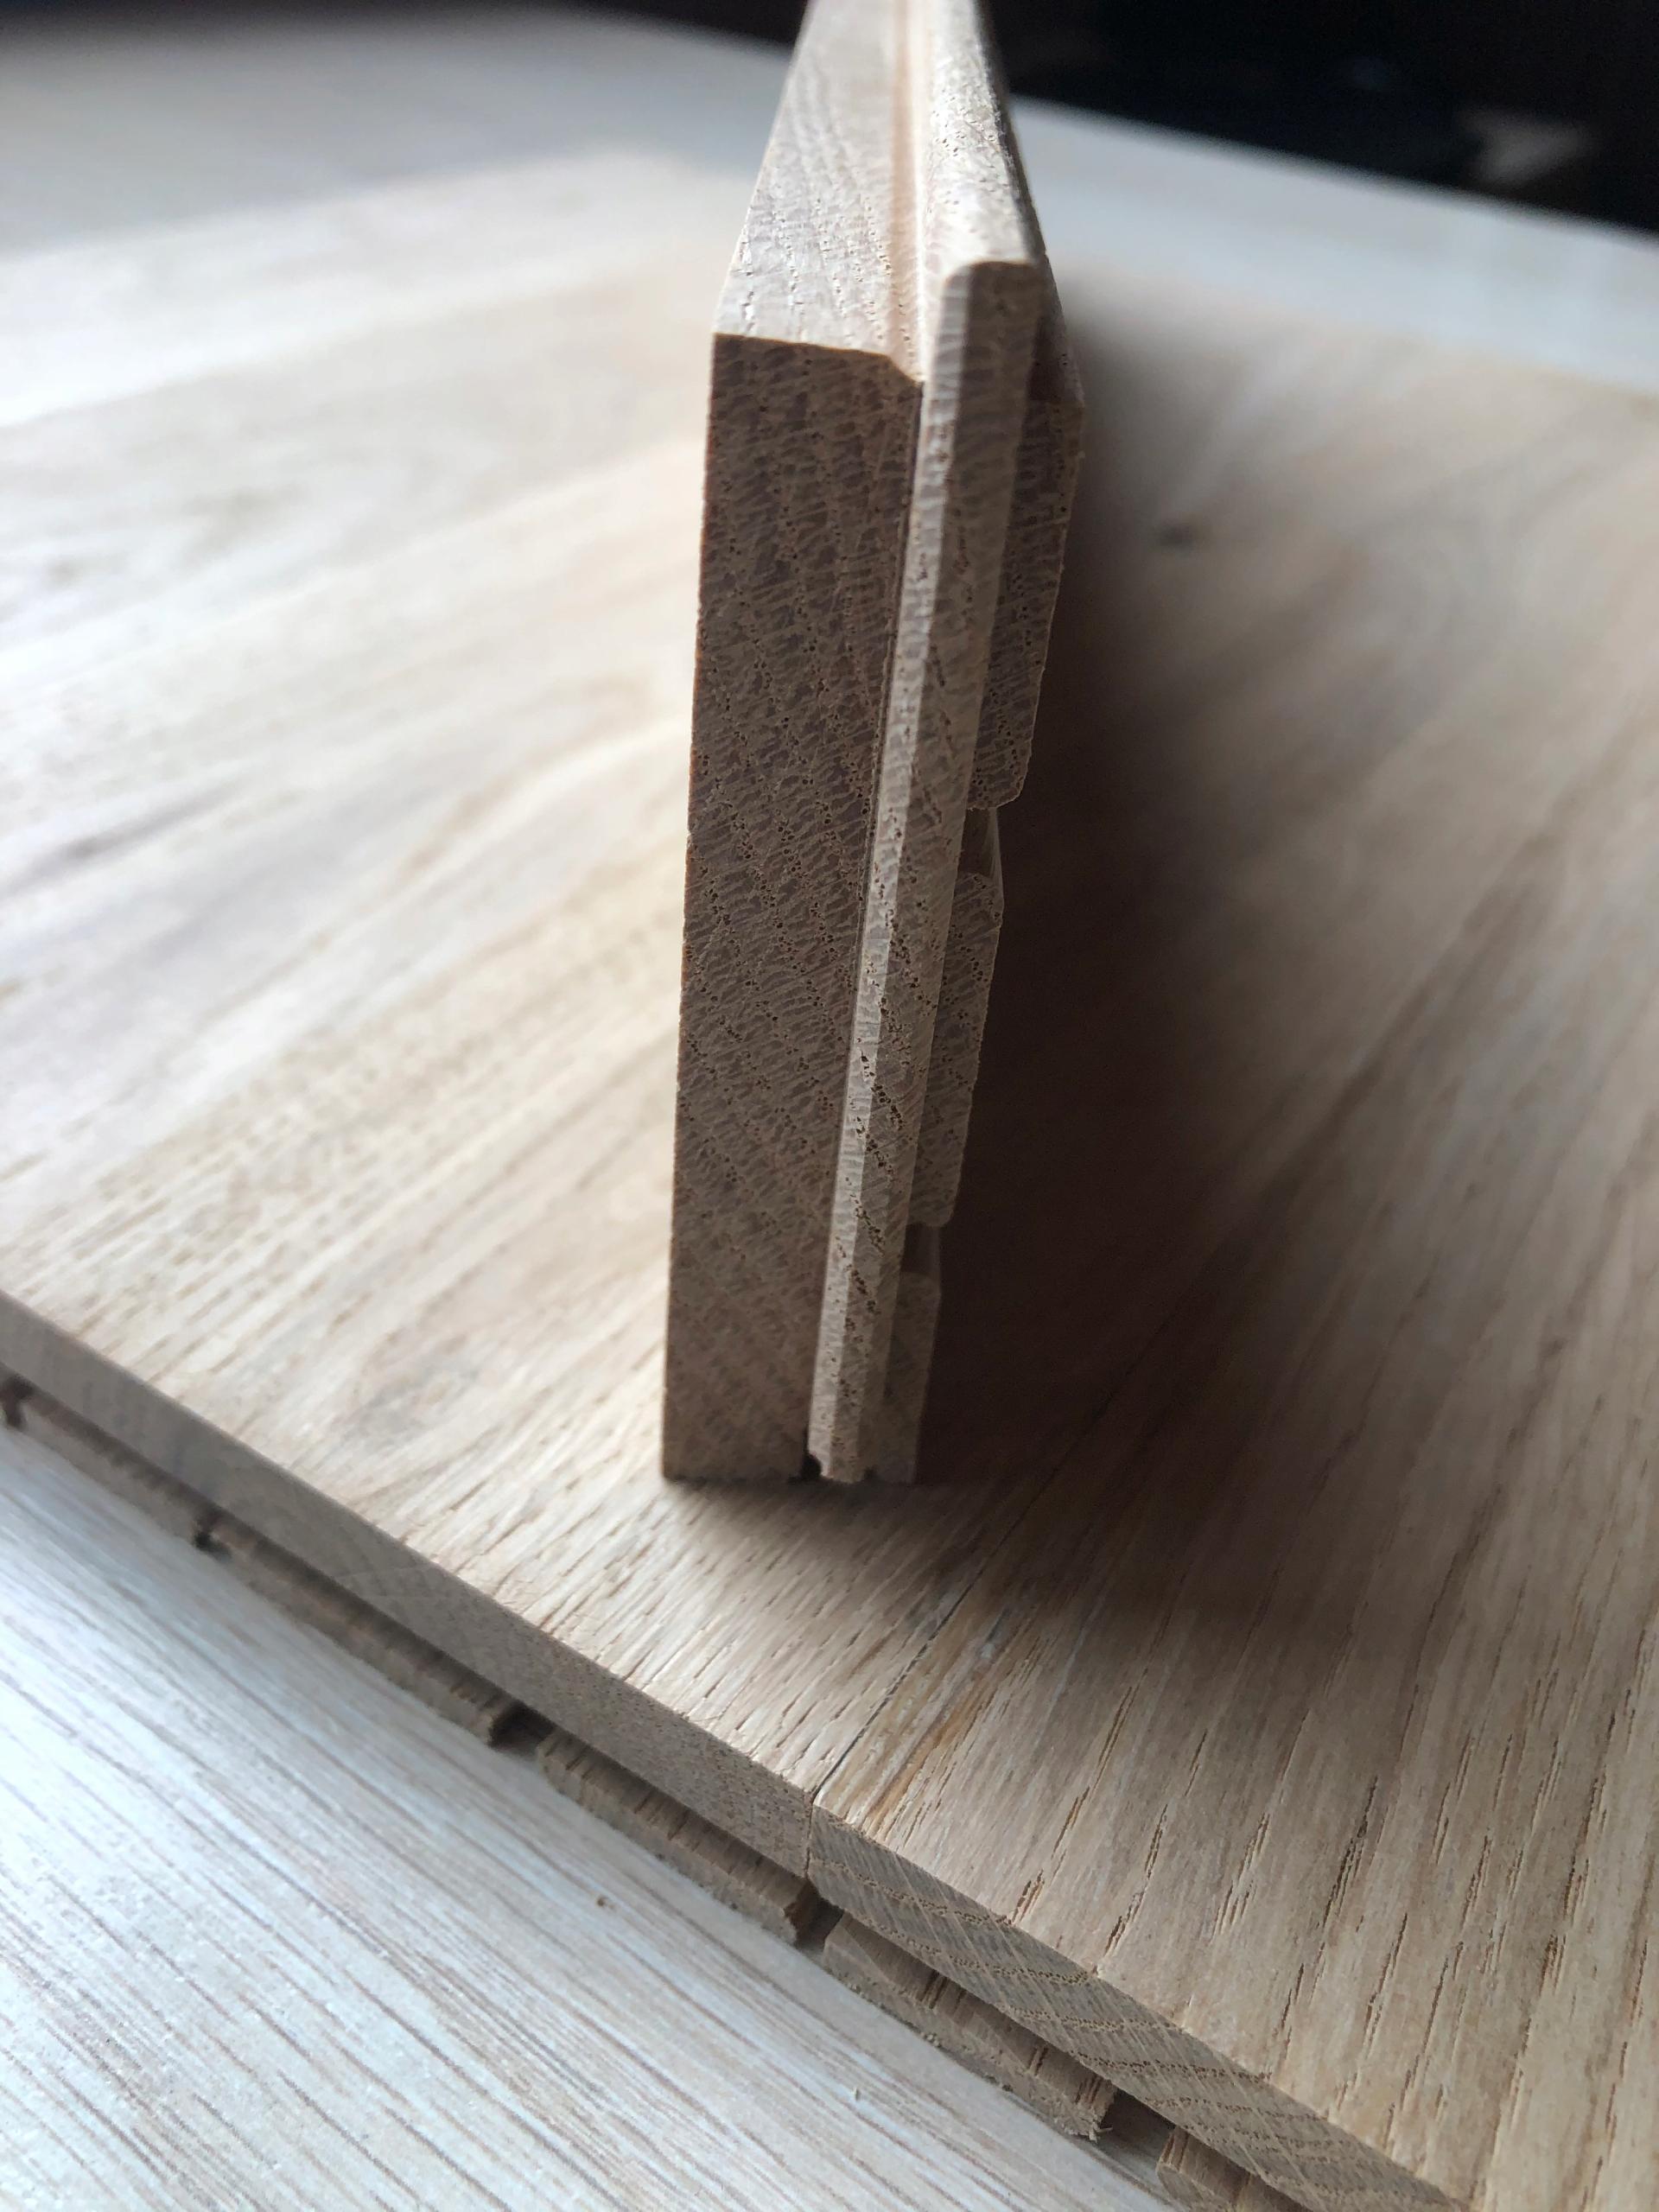 Masívne dubové parkety Výrobca, stupeň III 0,16x70x300